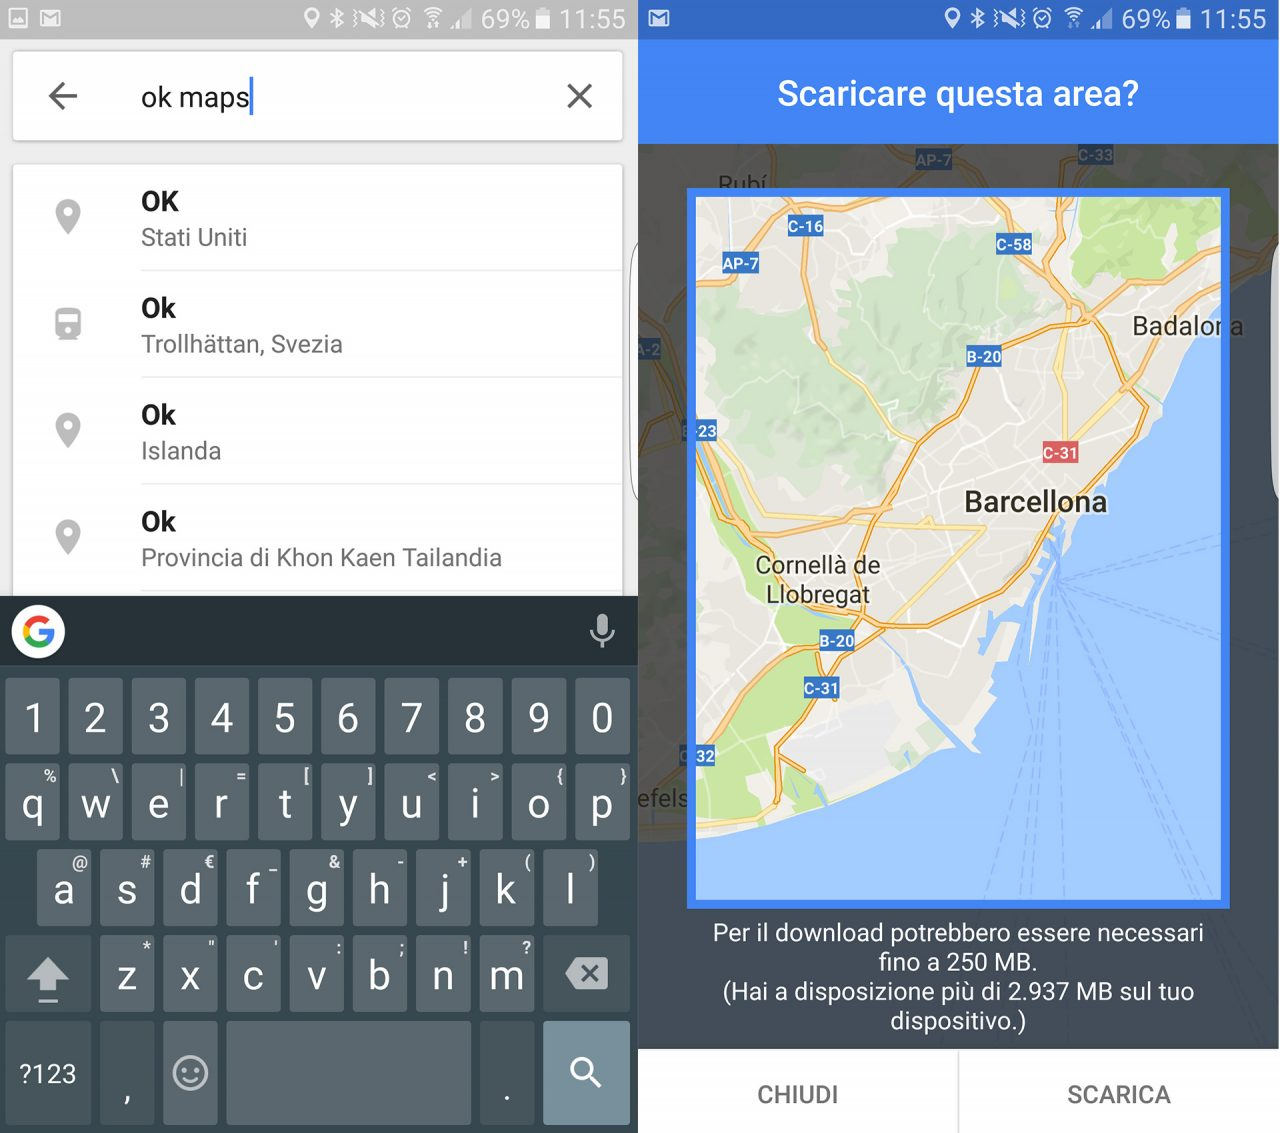 scaricare-mappe-offline